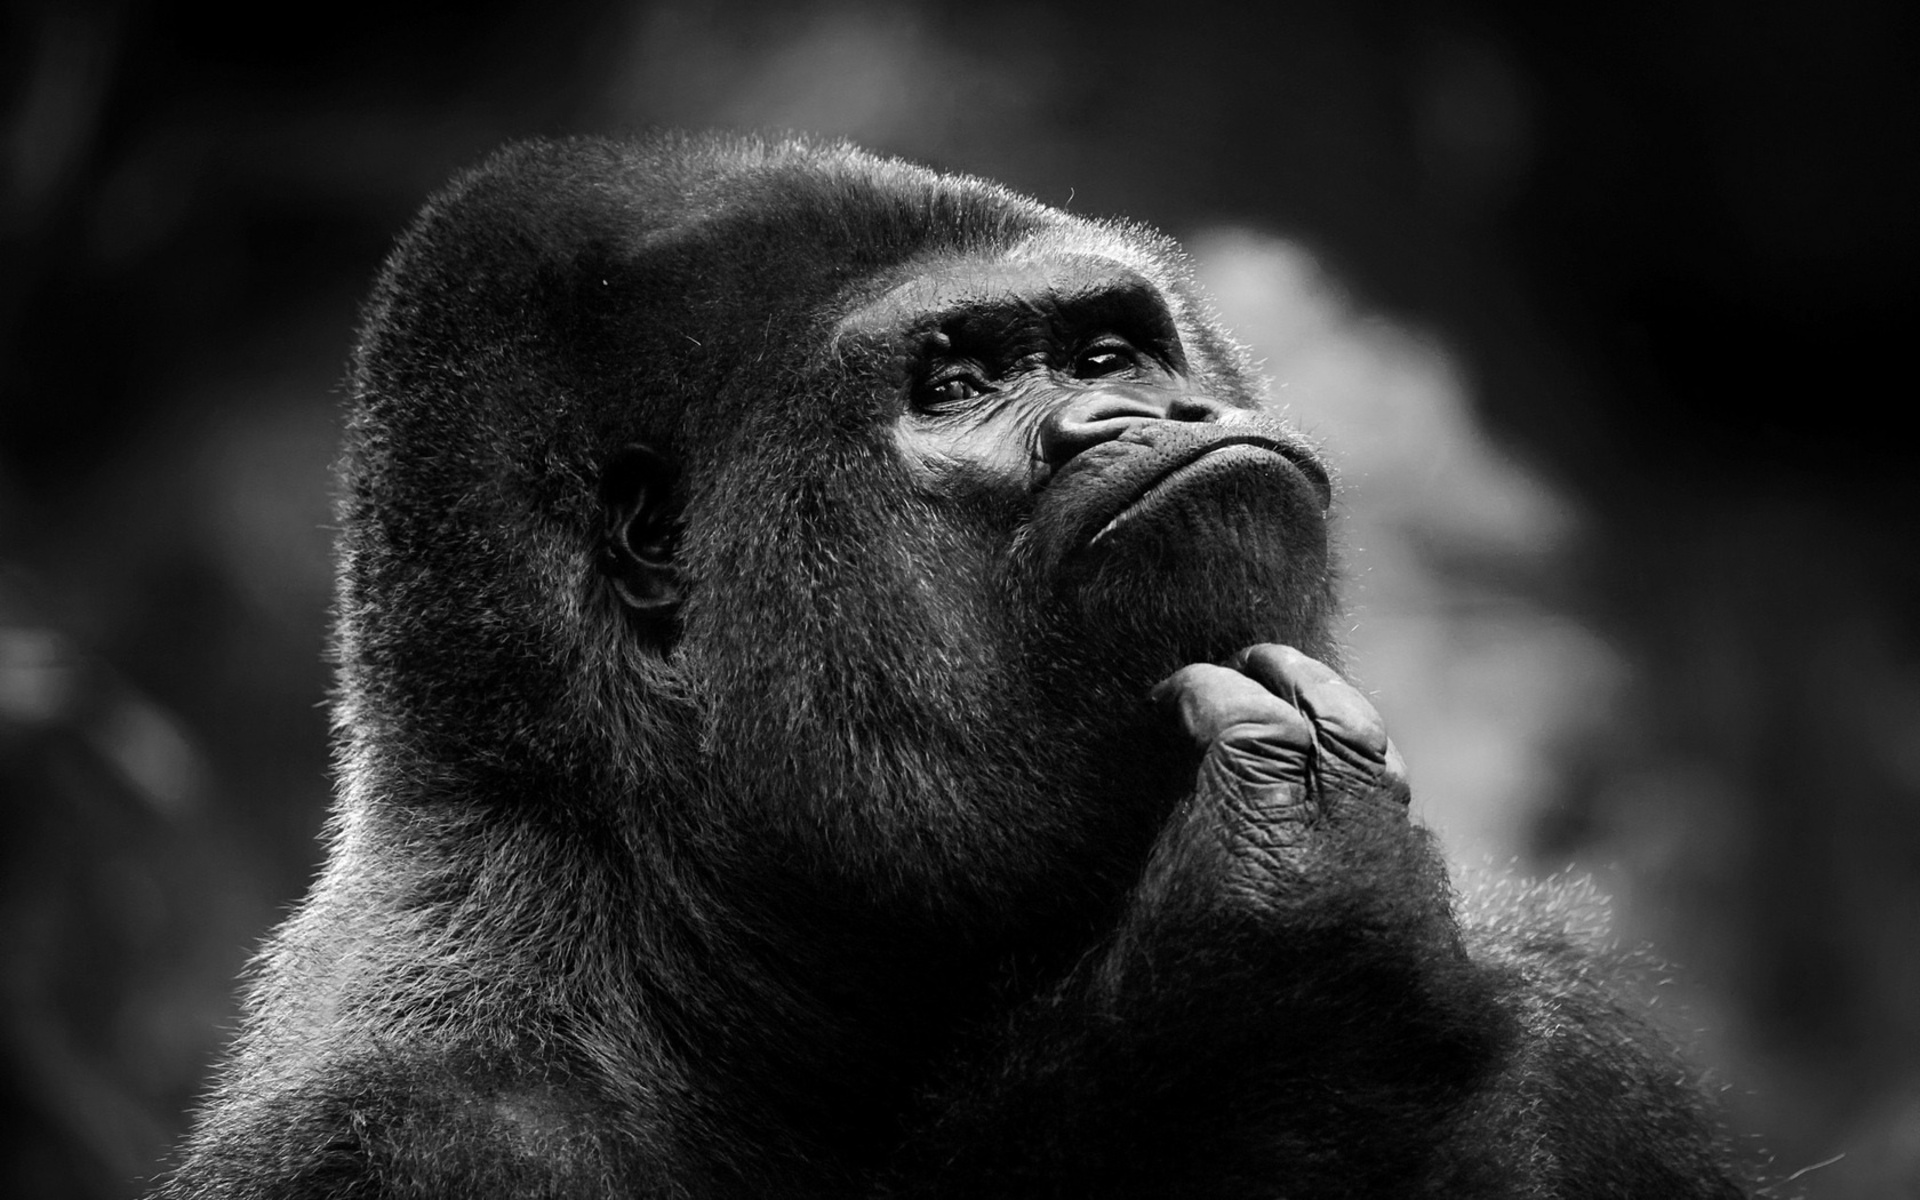 Gorilla wallpaper hd - photo#8